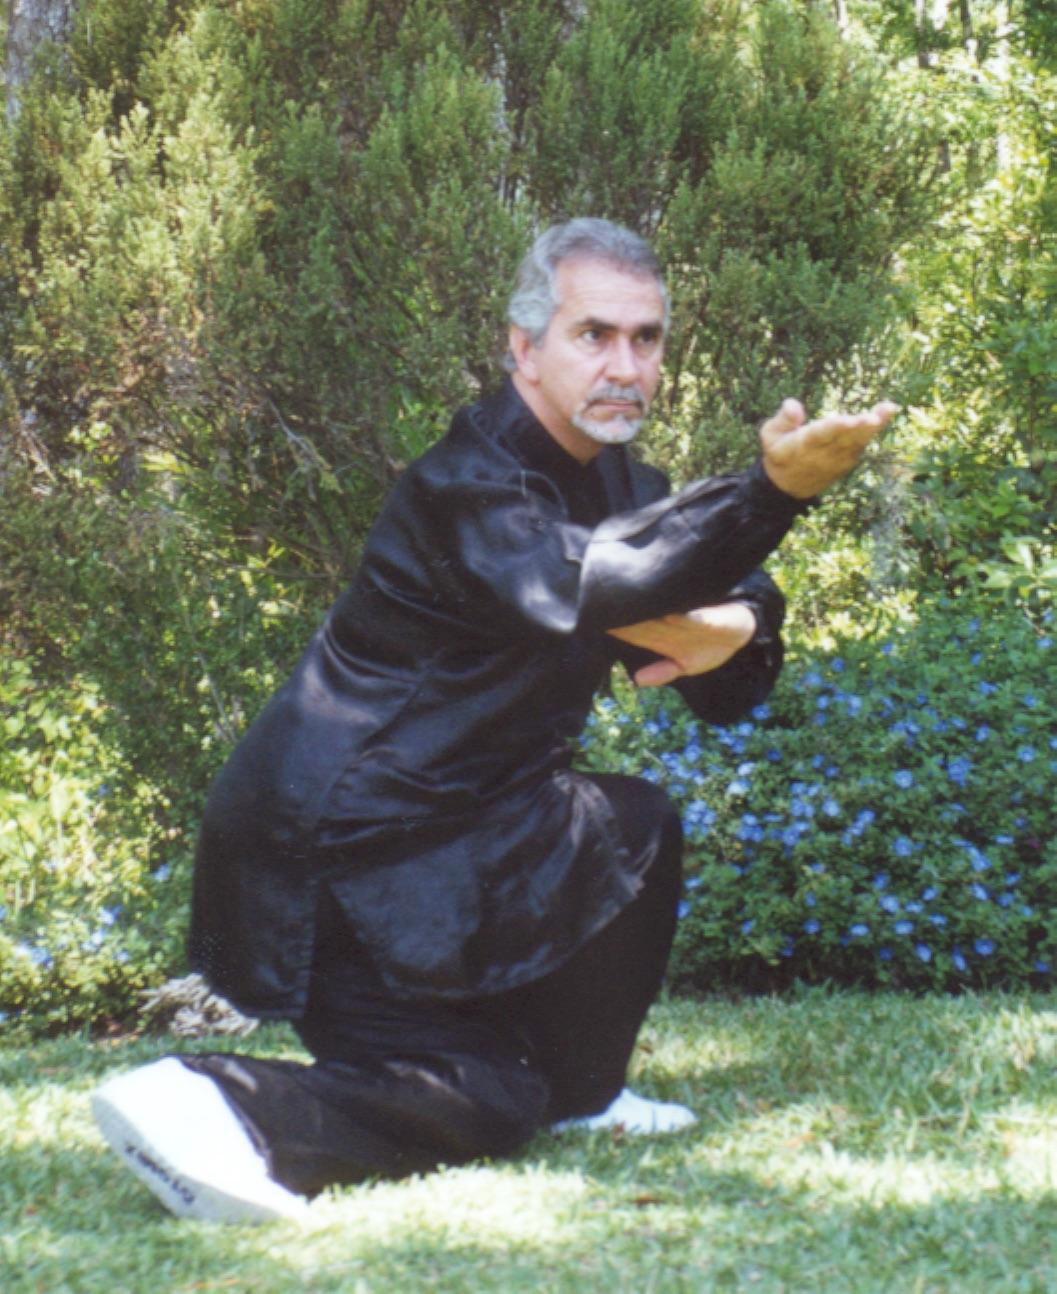 Sifu Paolillo in snake posture, late 90s